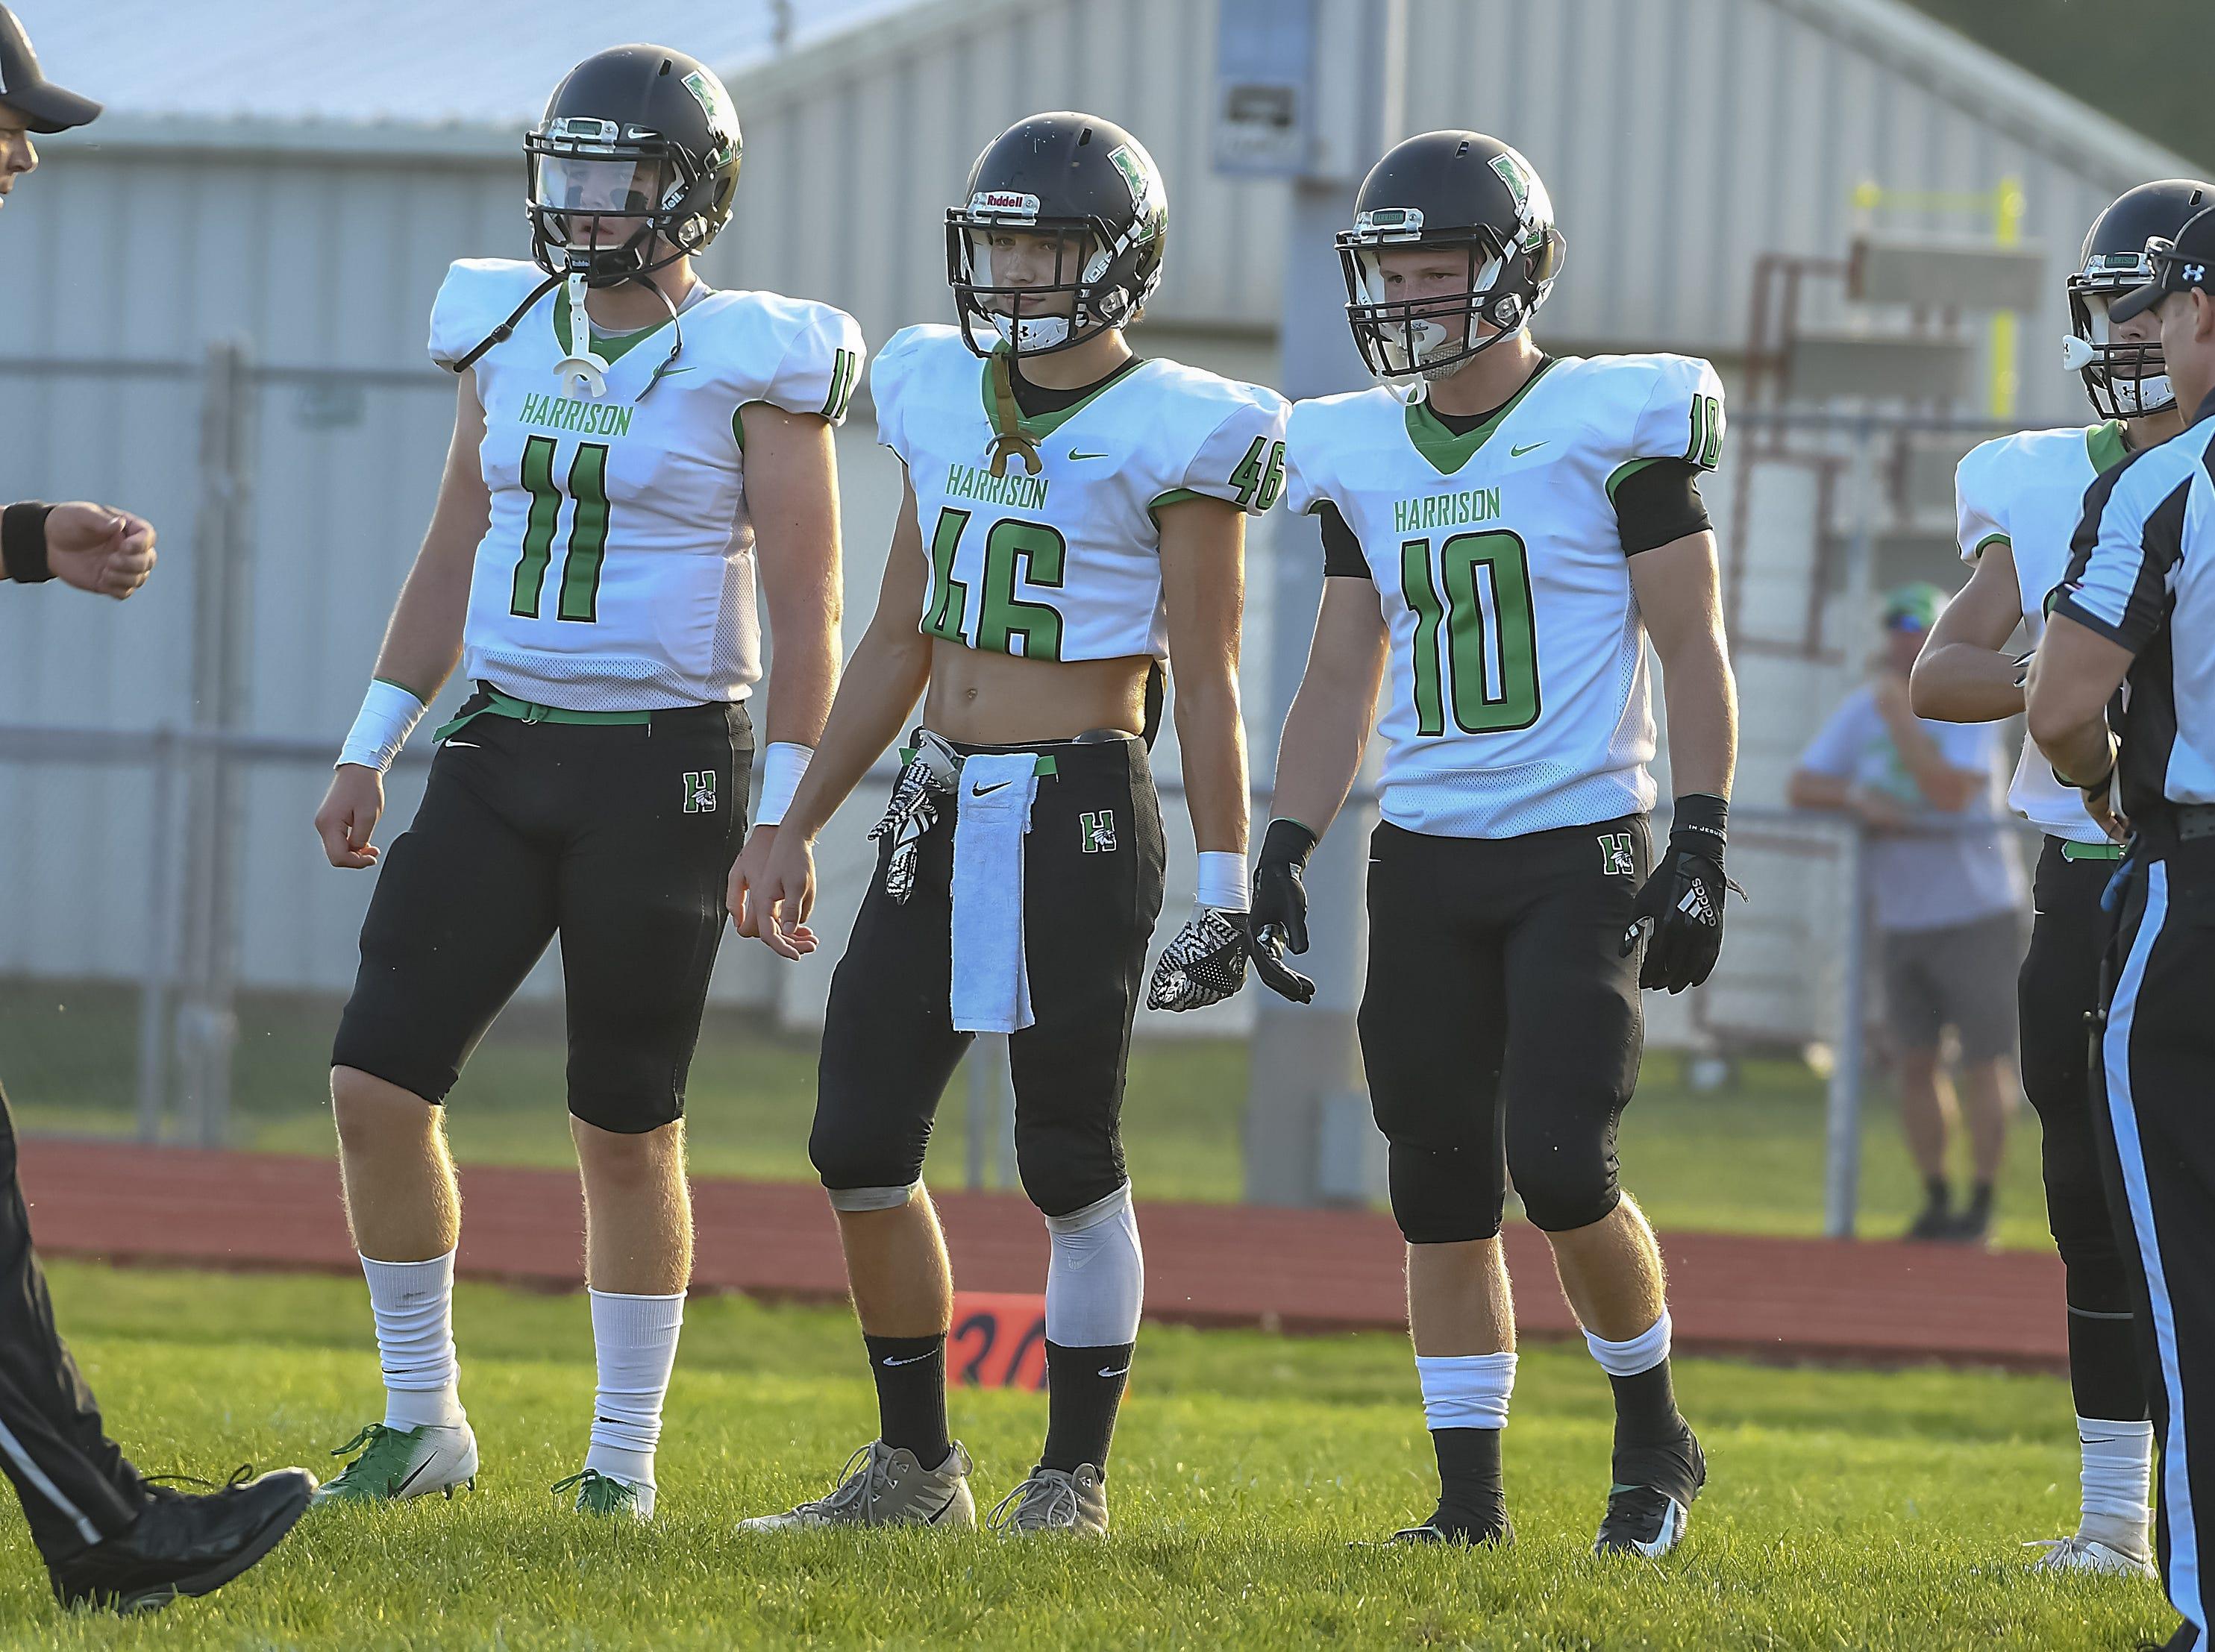 Harrison captains Connor Kinnett (11), Simon Shirley (46) and Levi Tidwell (10) walk out for the coin flip against Ross, Ross High School, Friday, September 14, 2018